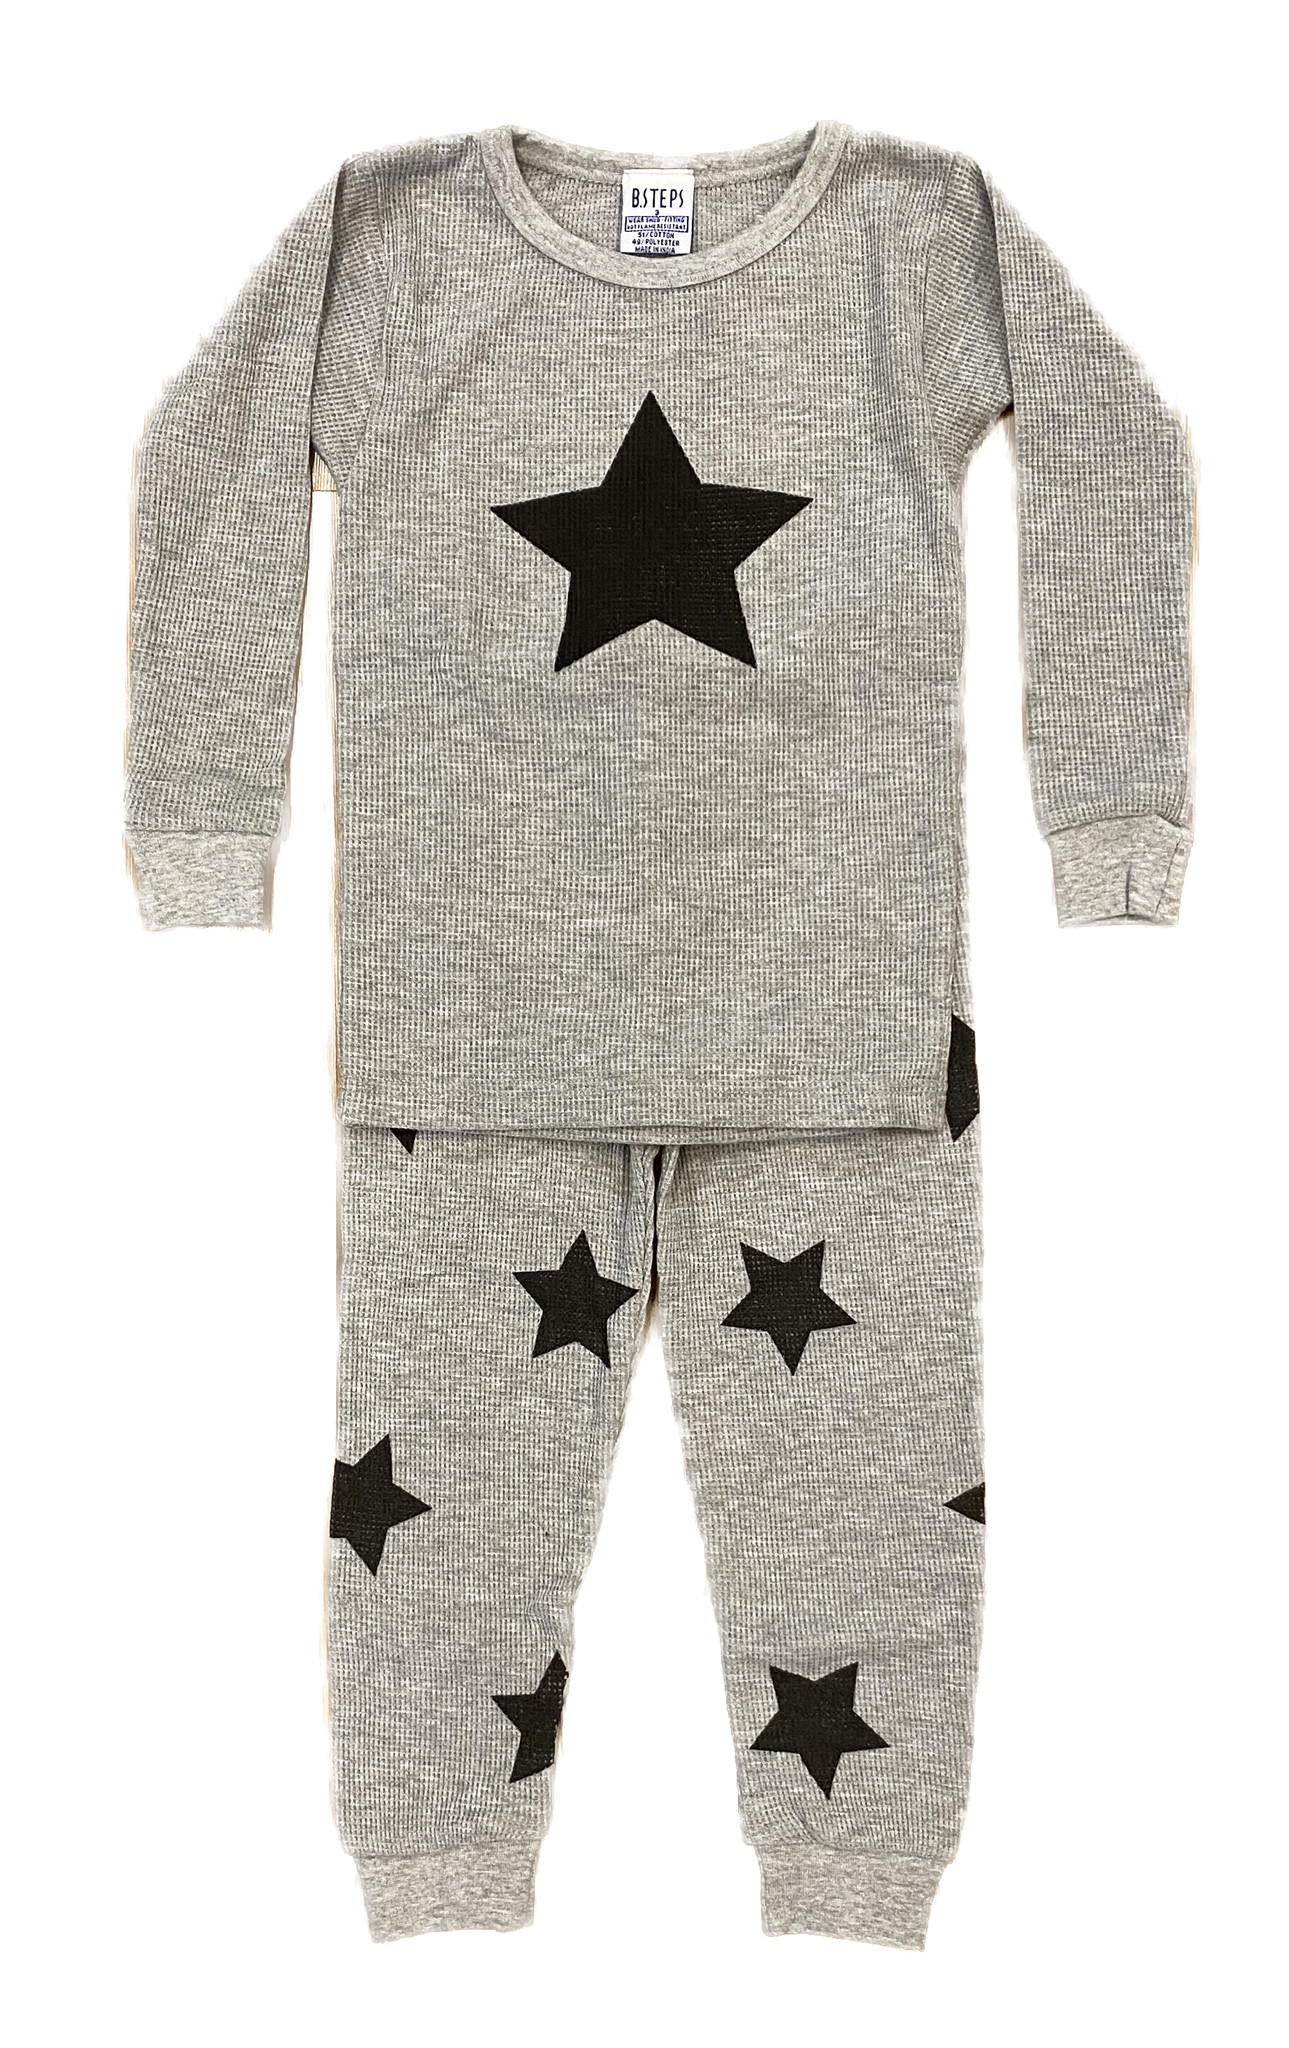 Baby Steps Heather Grey Star Thermal PJ Set